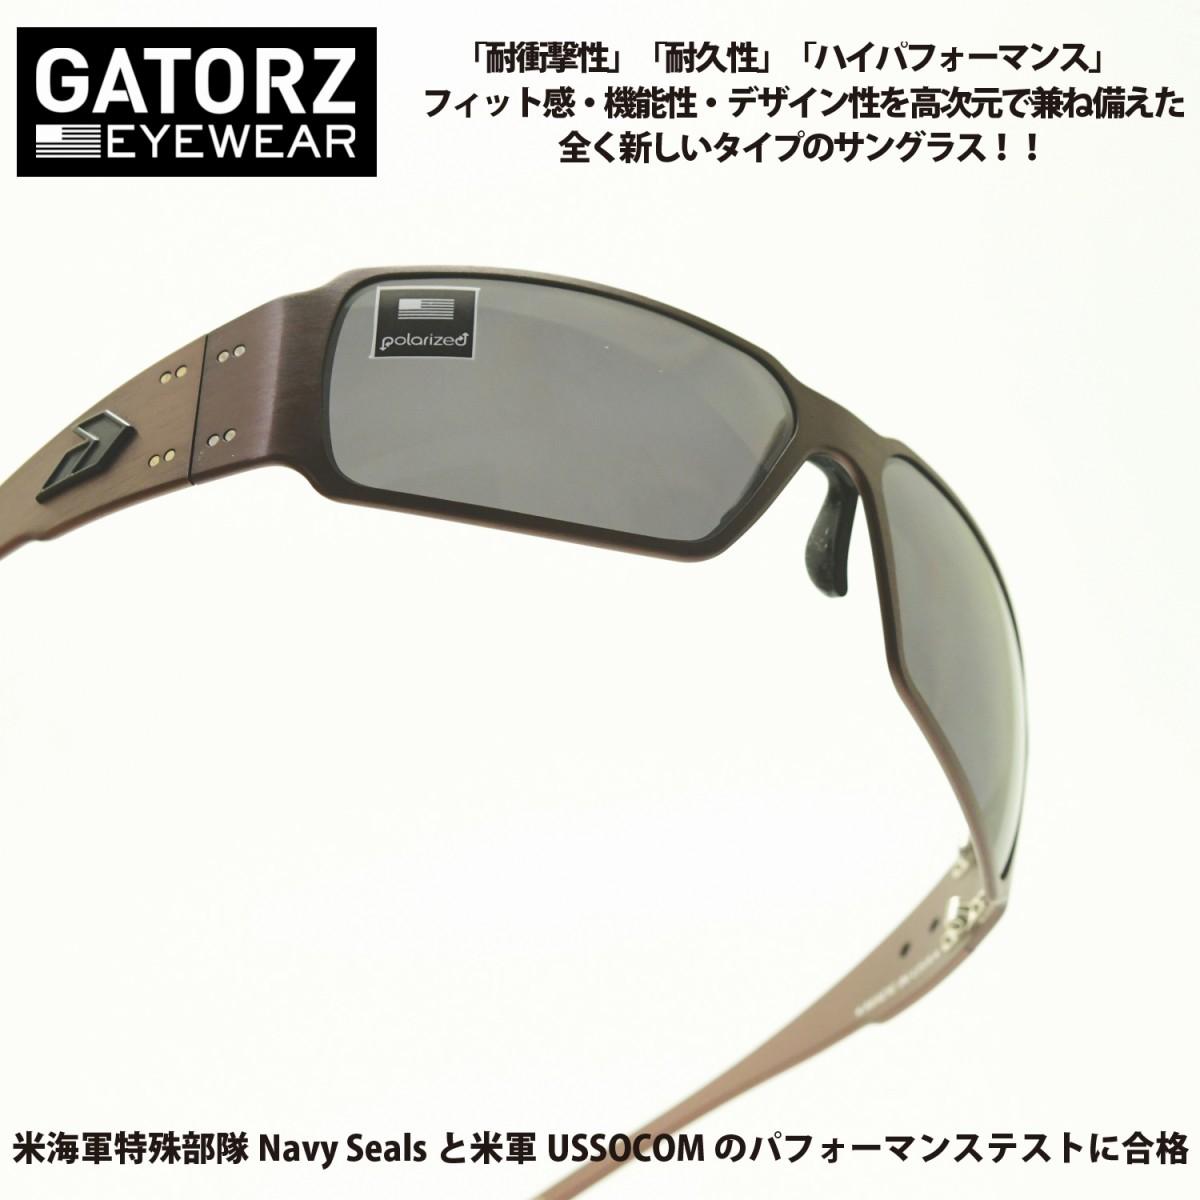 GATORZ ゲイターズBOXSTER ボクスター(TACTICAL COPPER/SMOKE POLA)